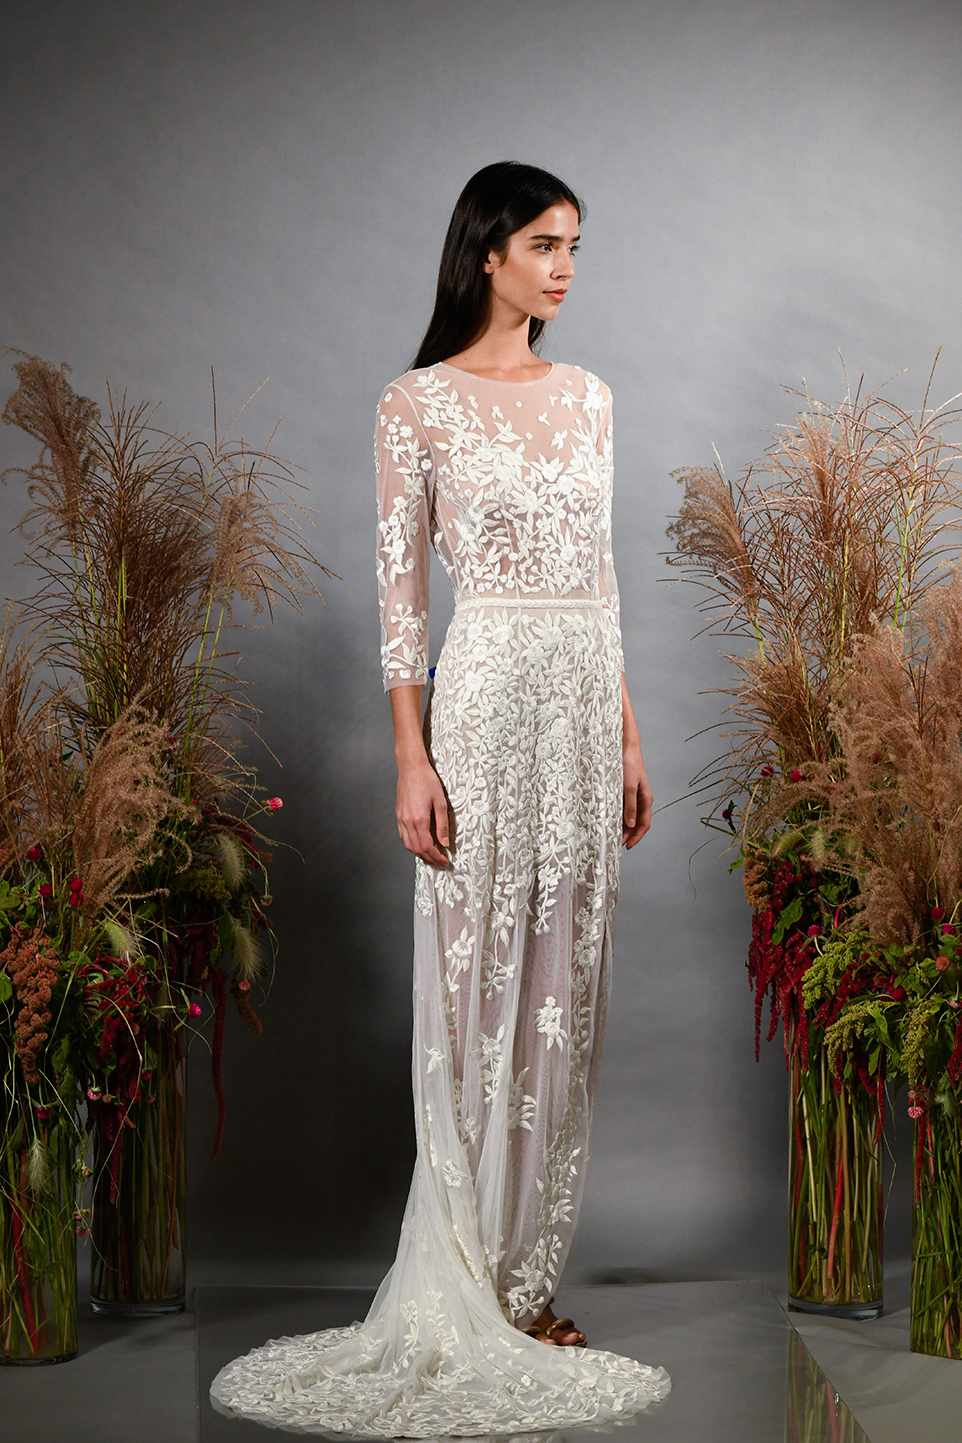 Model in sheer sleeved wedding dress